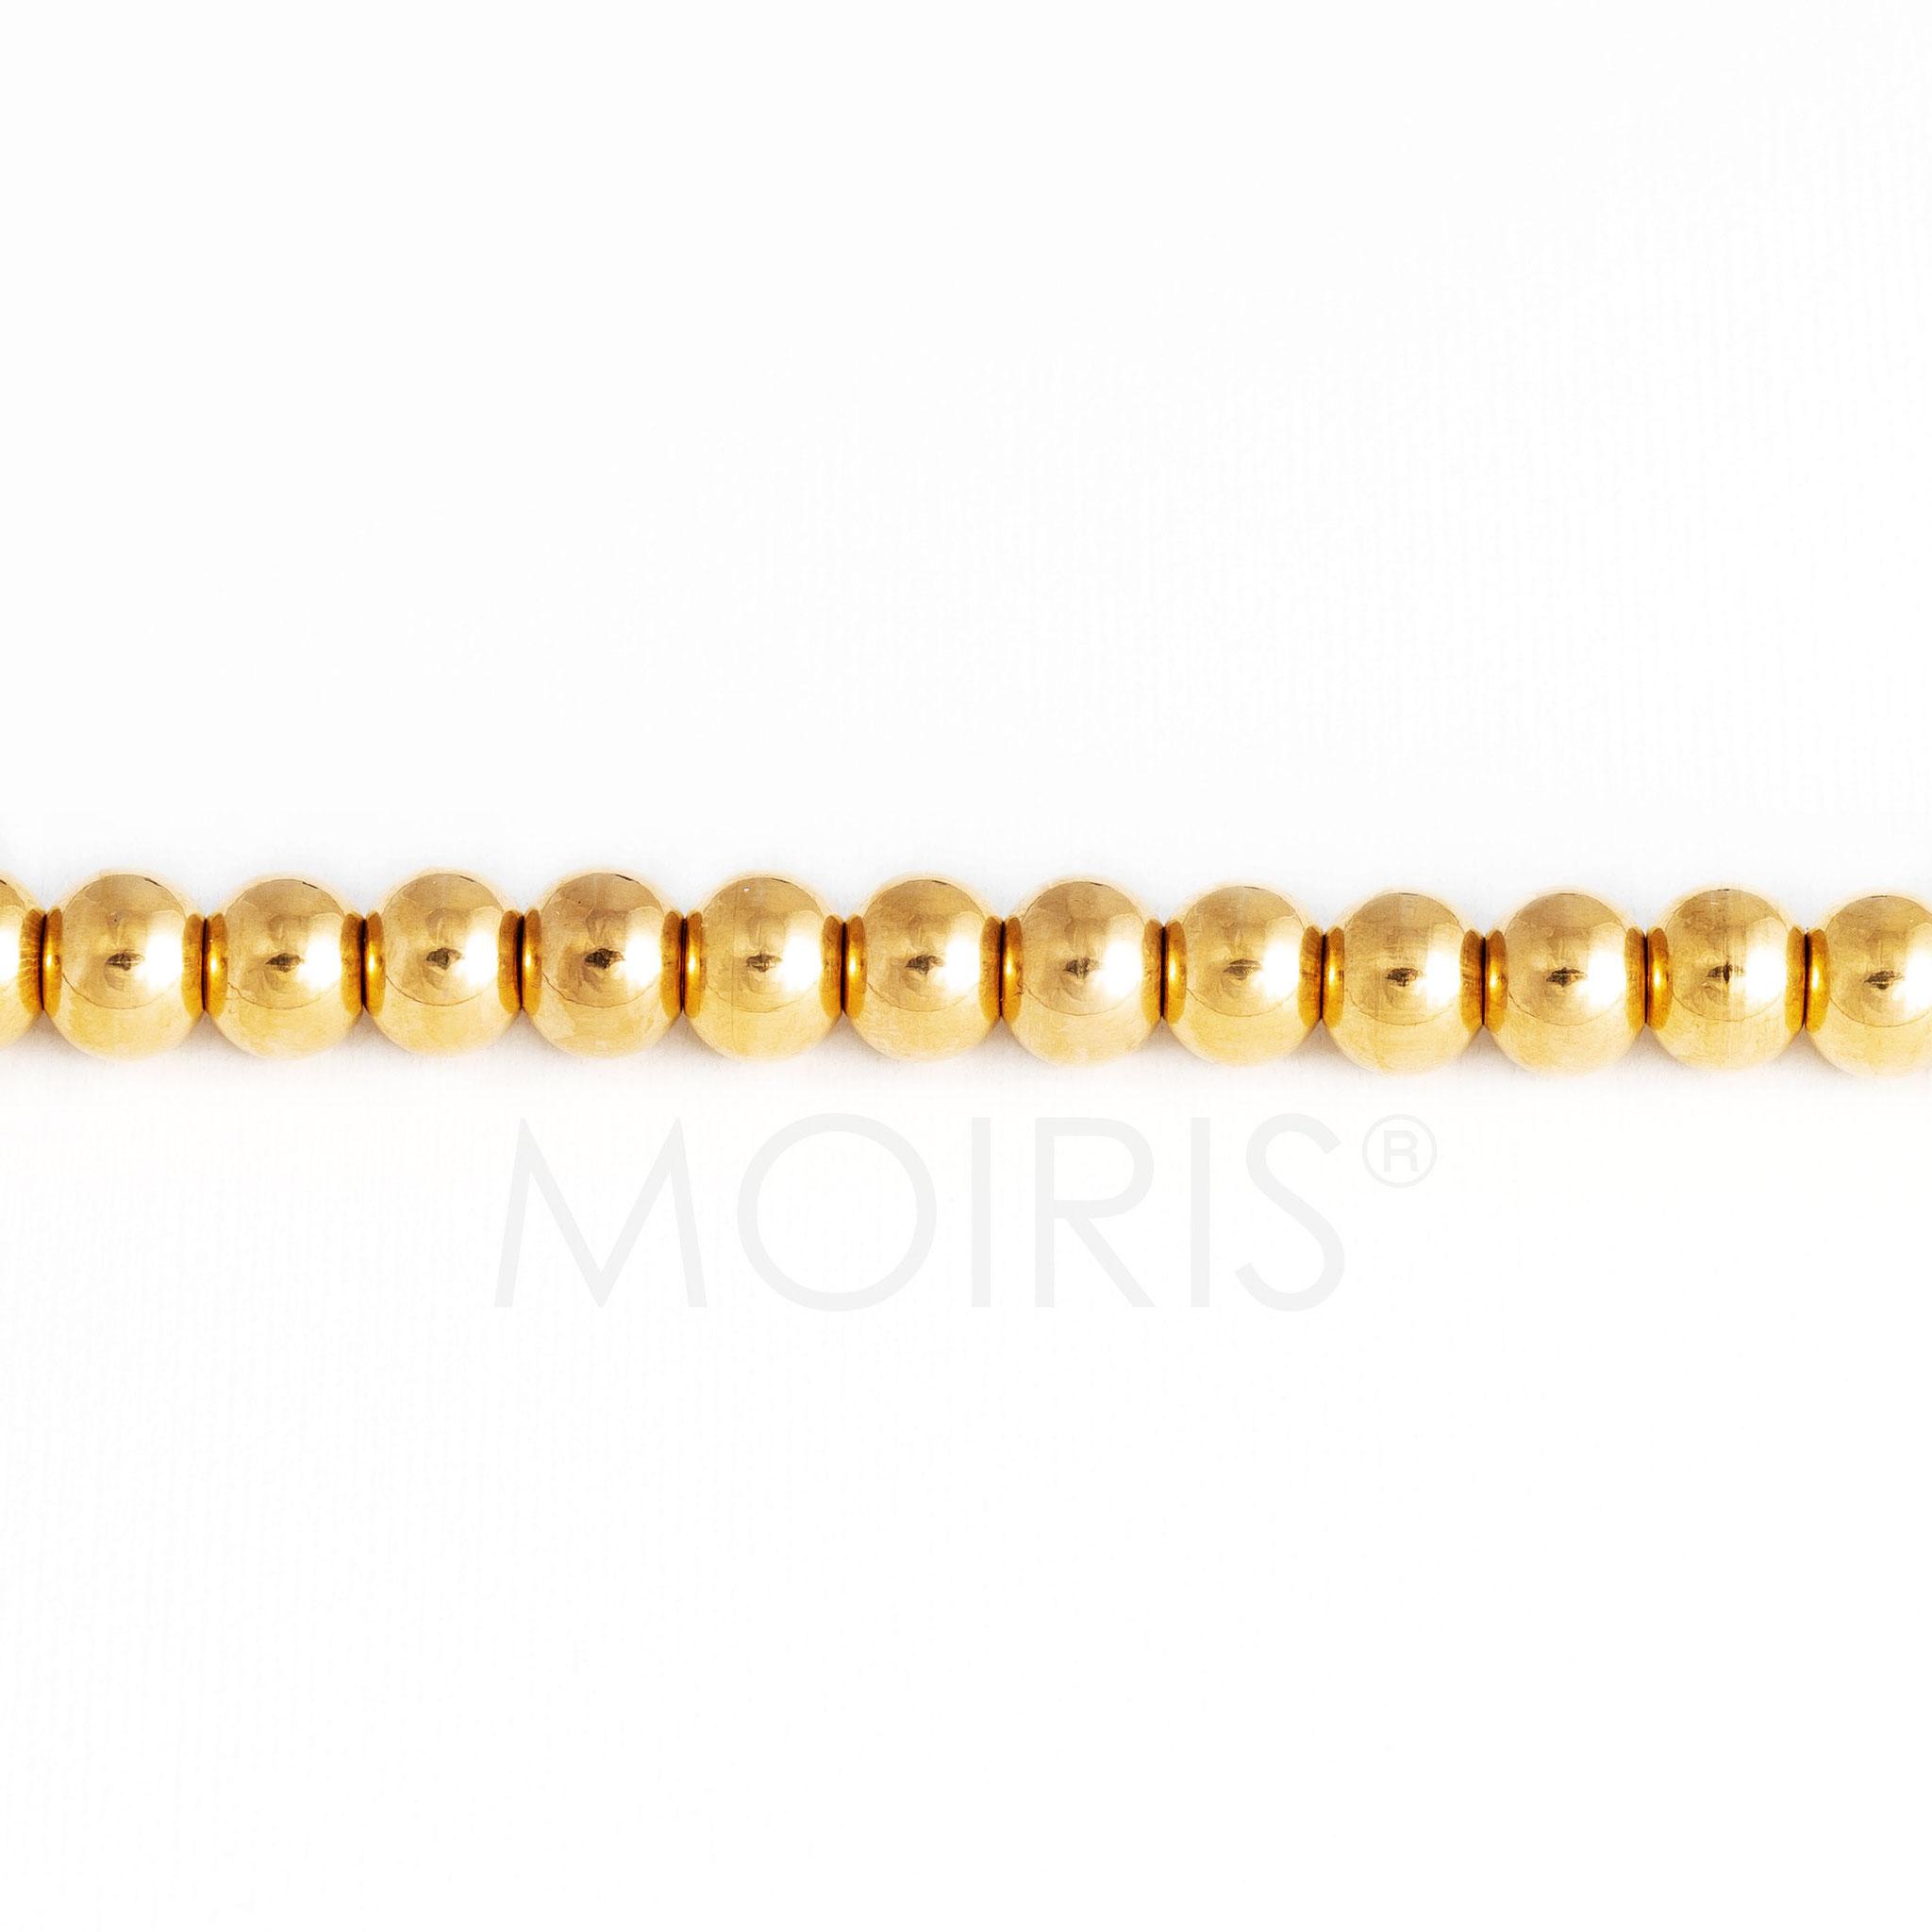 BH-Schmuckträger Virginia Gold 6mm